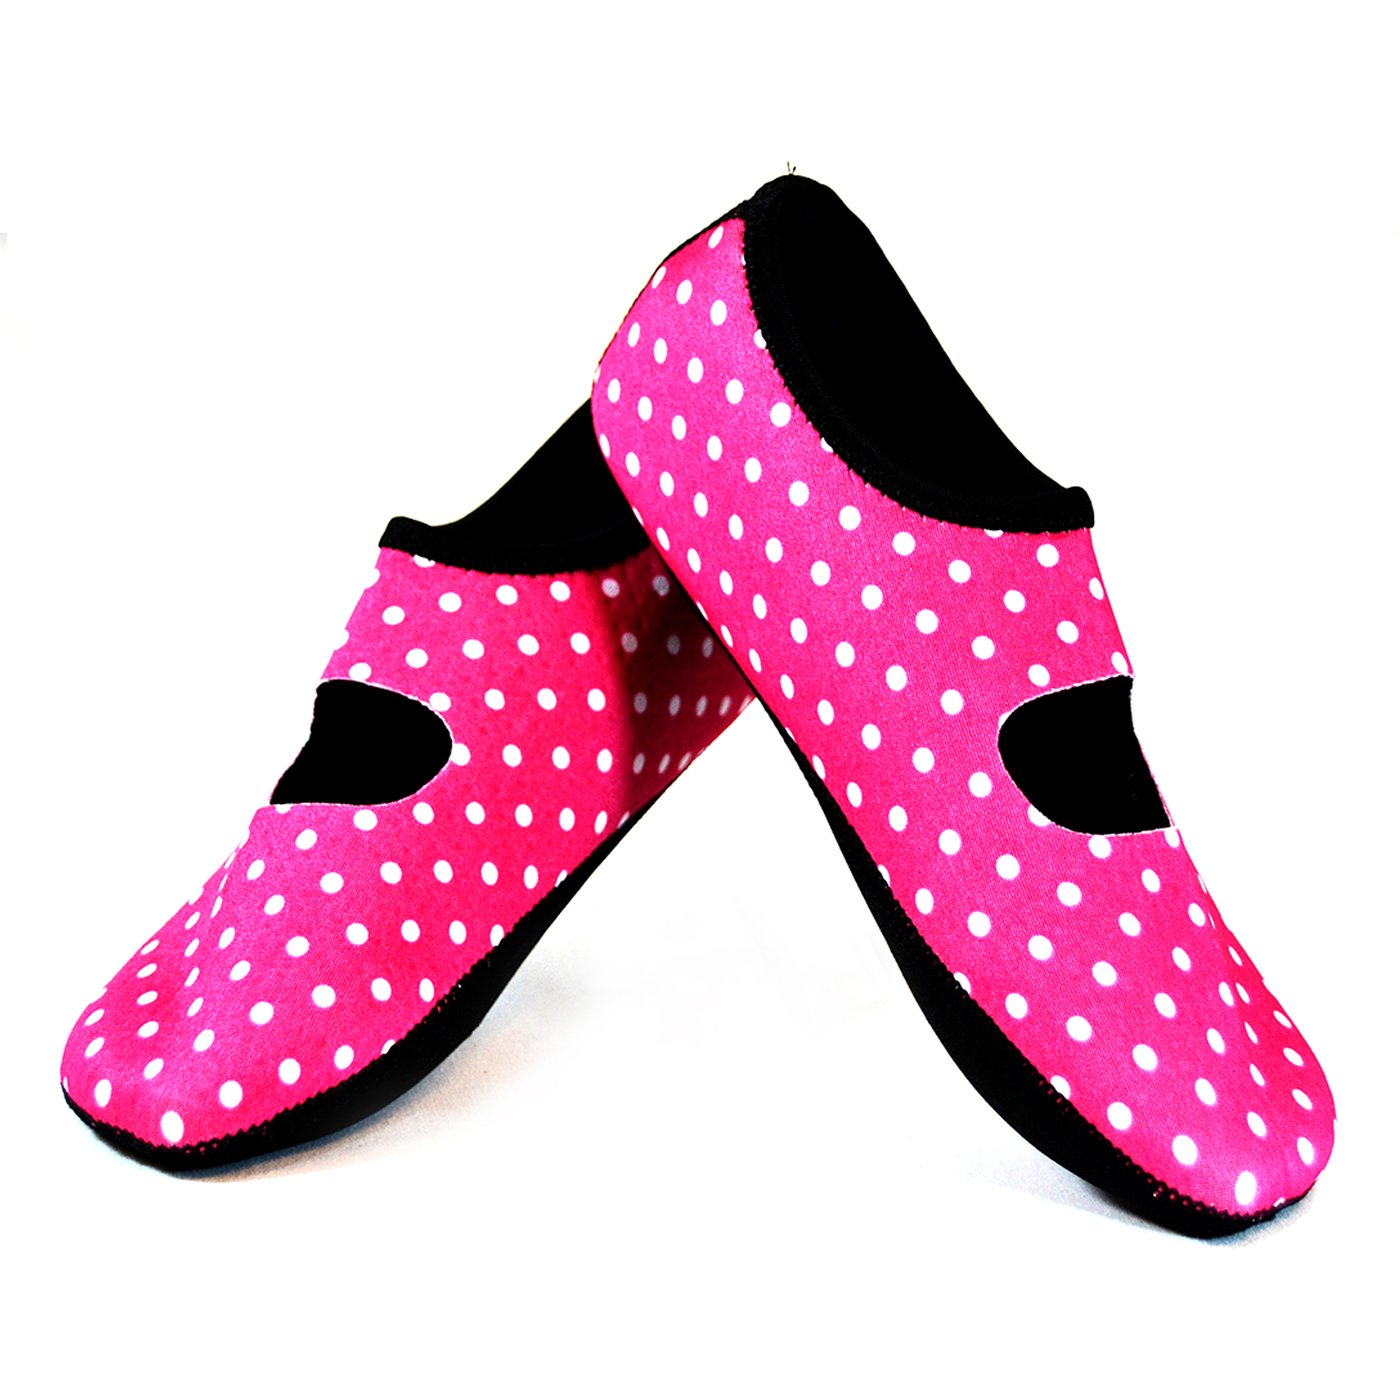 NuFoot Mary Janes Women's Shoes, Best Foldable & Flexible Flats, Slipper Socks, Travel Slippers & Exercise Shoes, Dance Shoes, Yoga Socks, House Shoes, Indoor Slippers, Pink Polka Dots, Medium